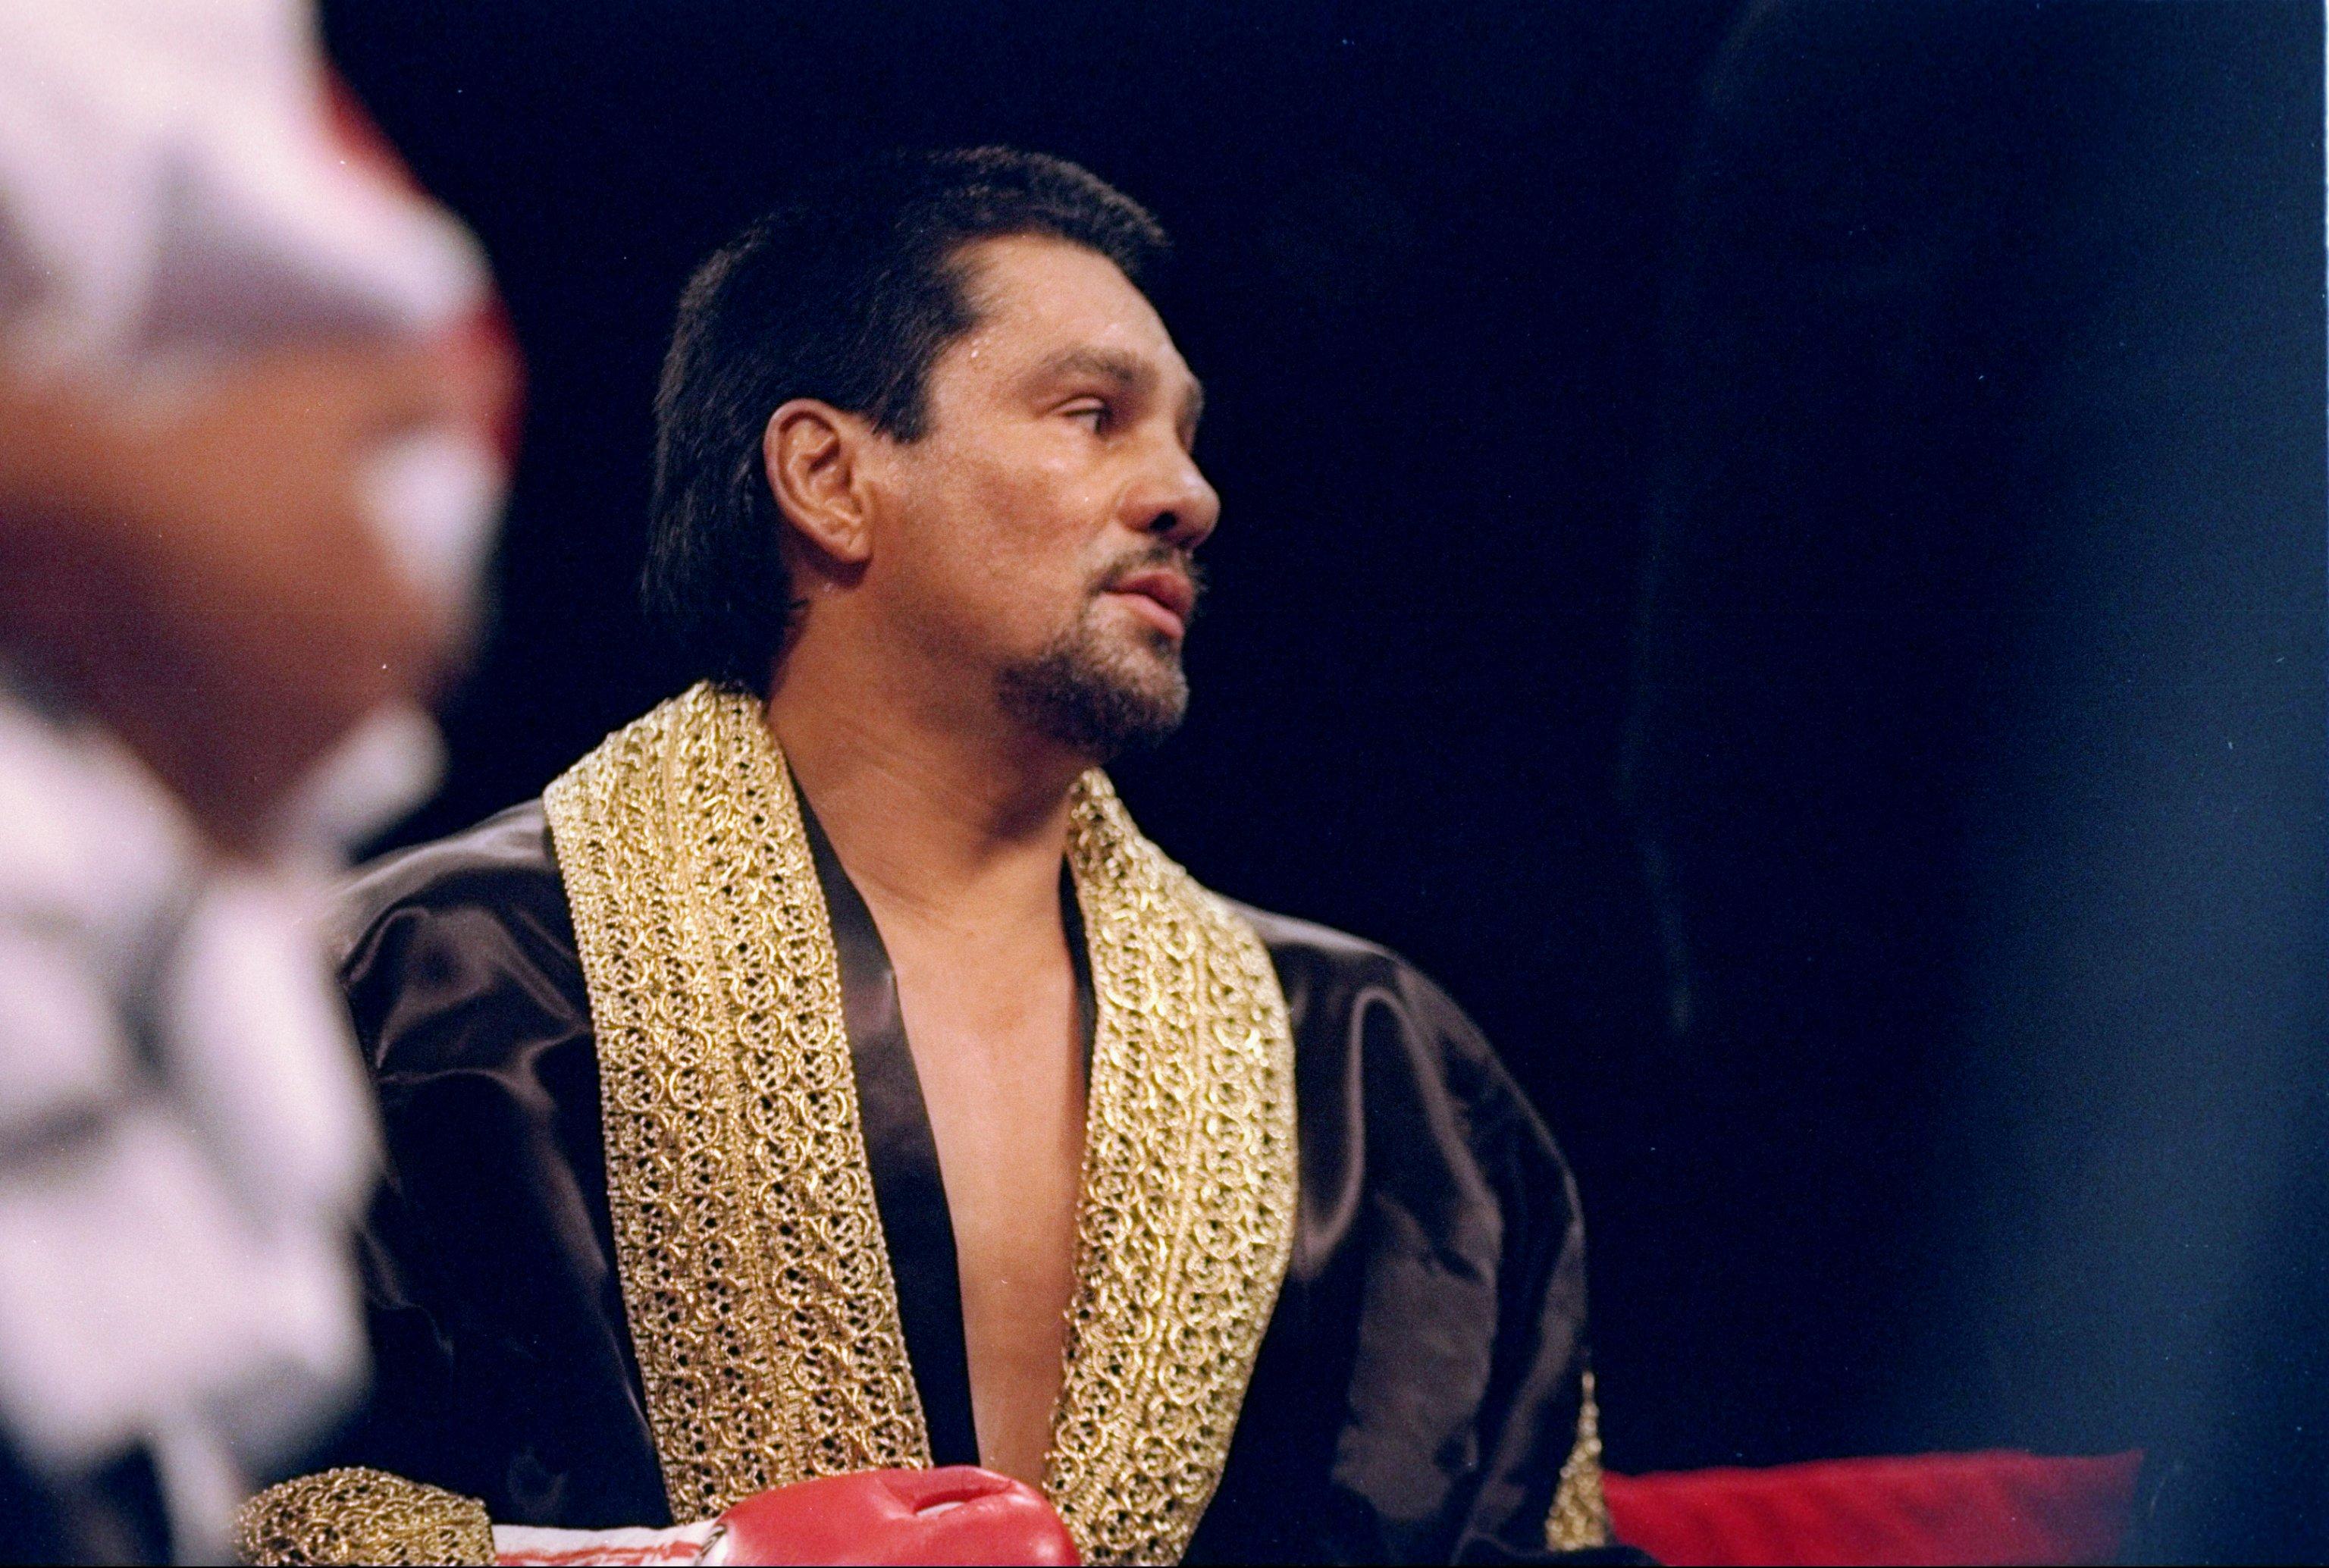 25 Jun 1994: Roberto Duran looks on during his bout against Vinny Pazienza in Las Vegas, Nevada.